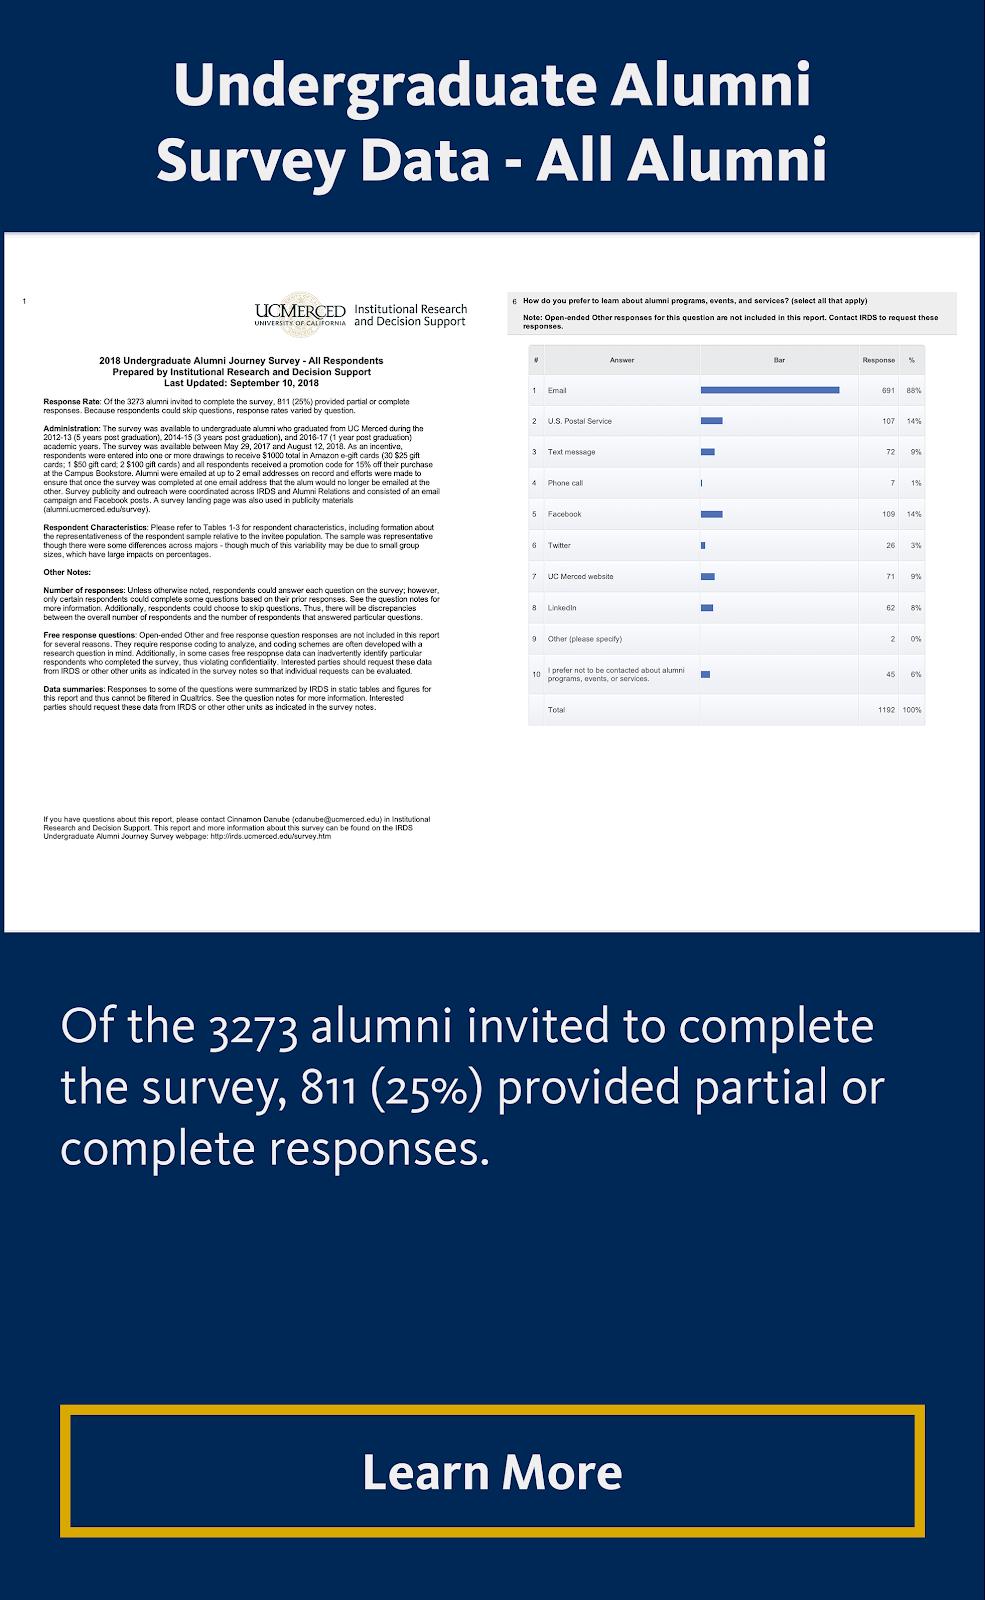 2018 Undergraduate Alumni Survey Data